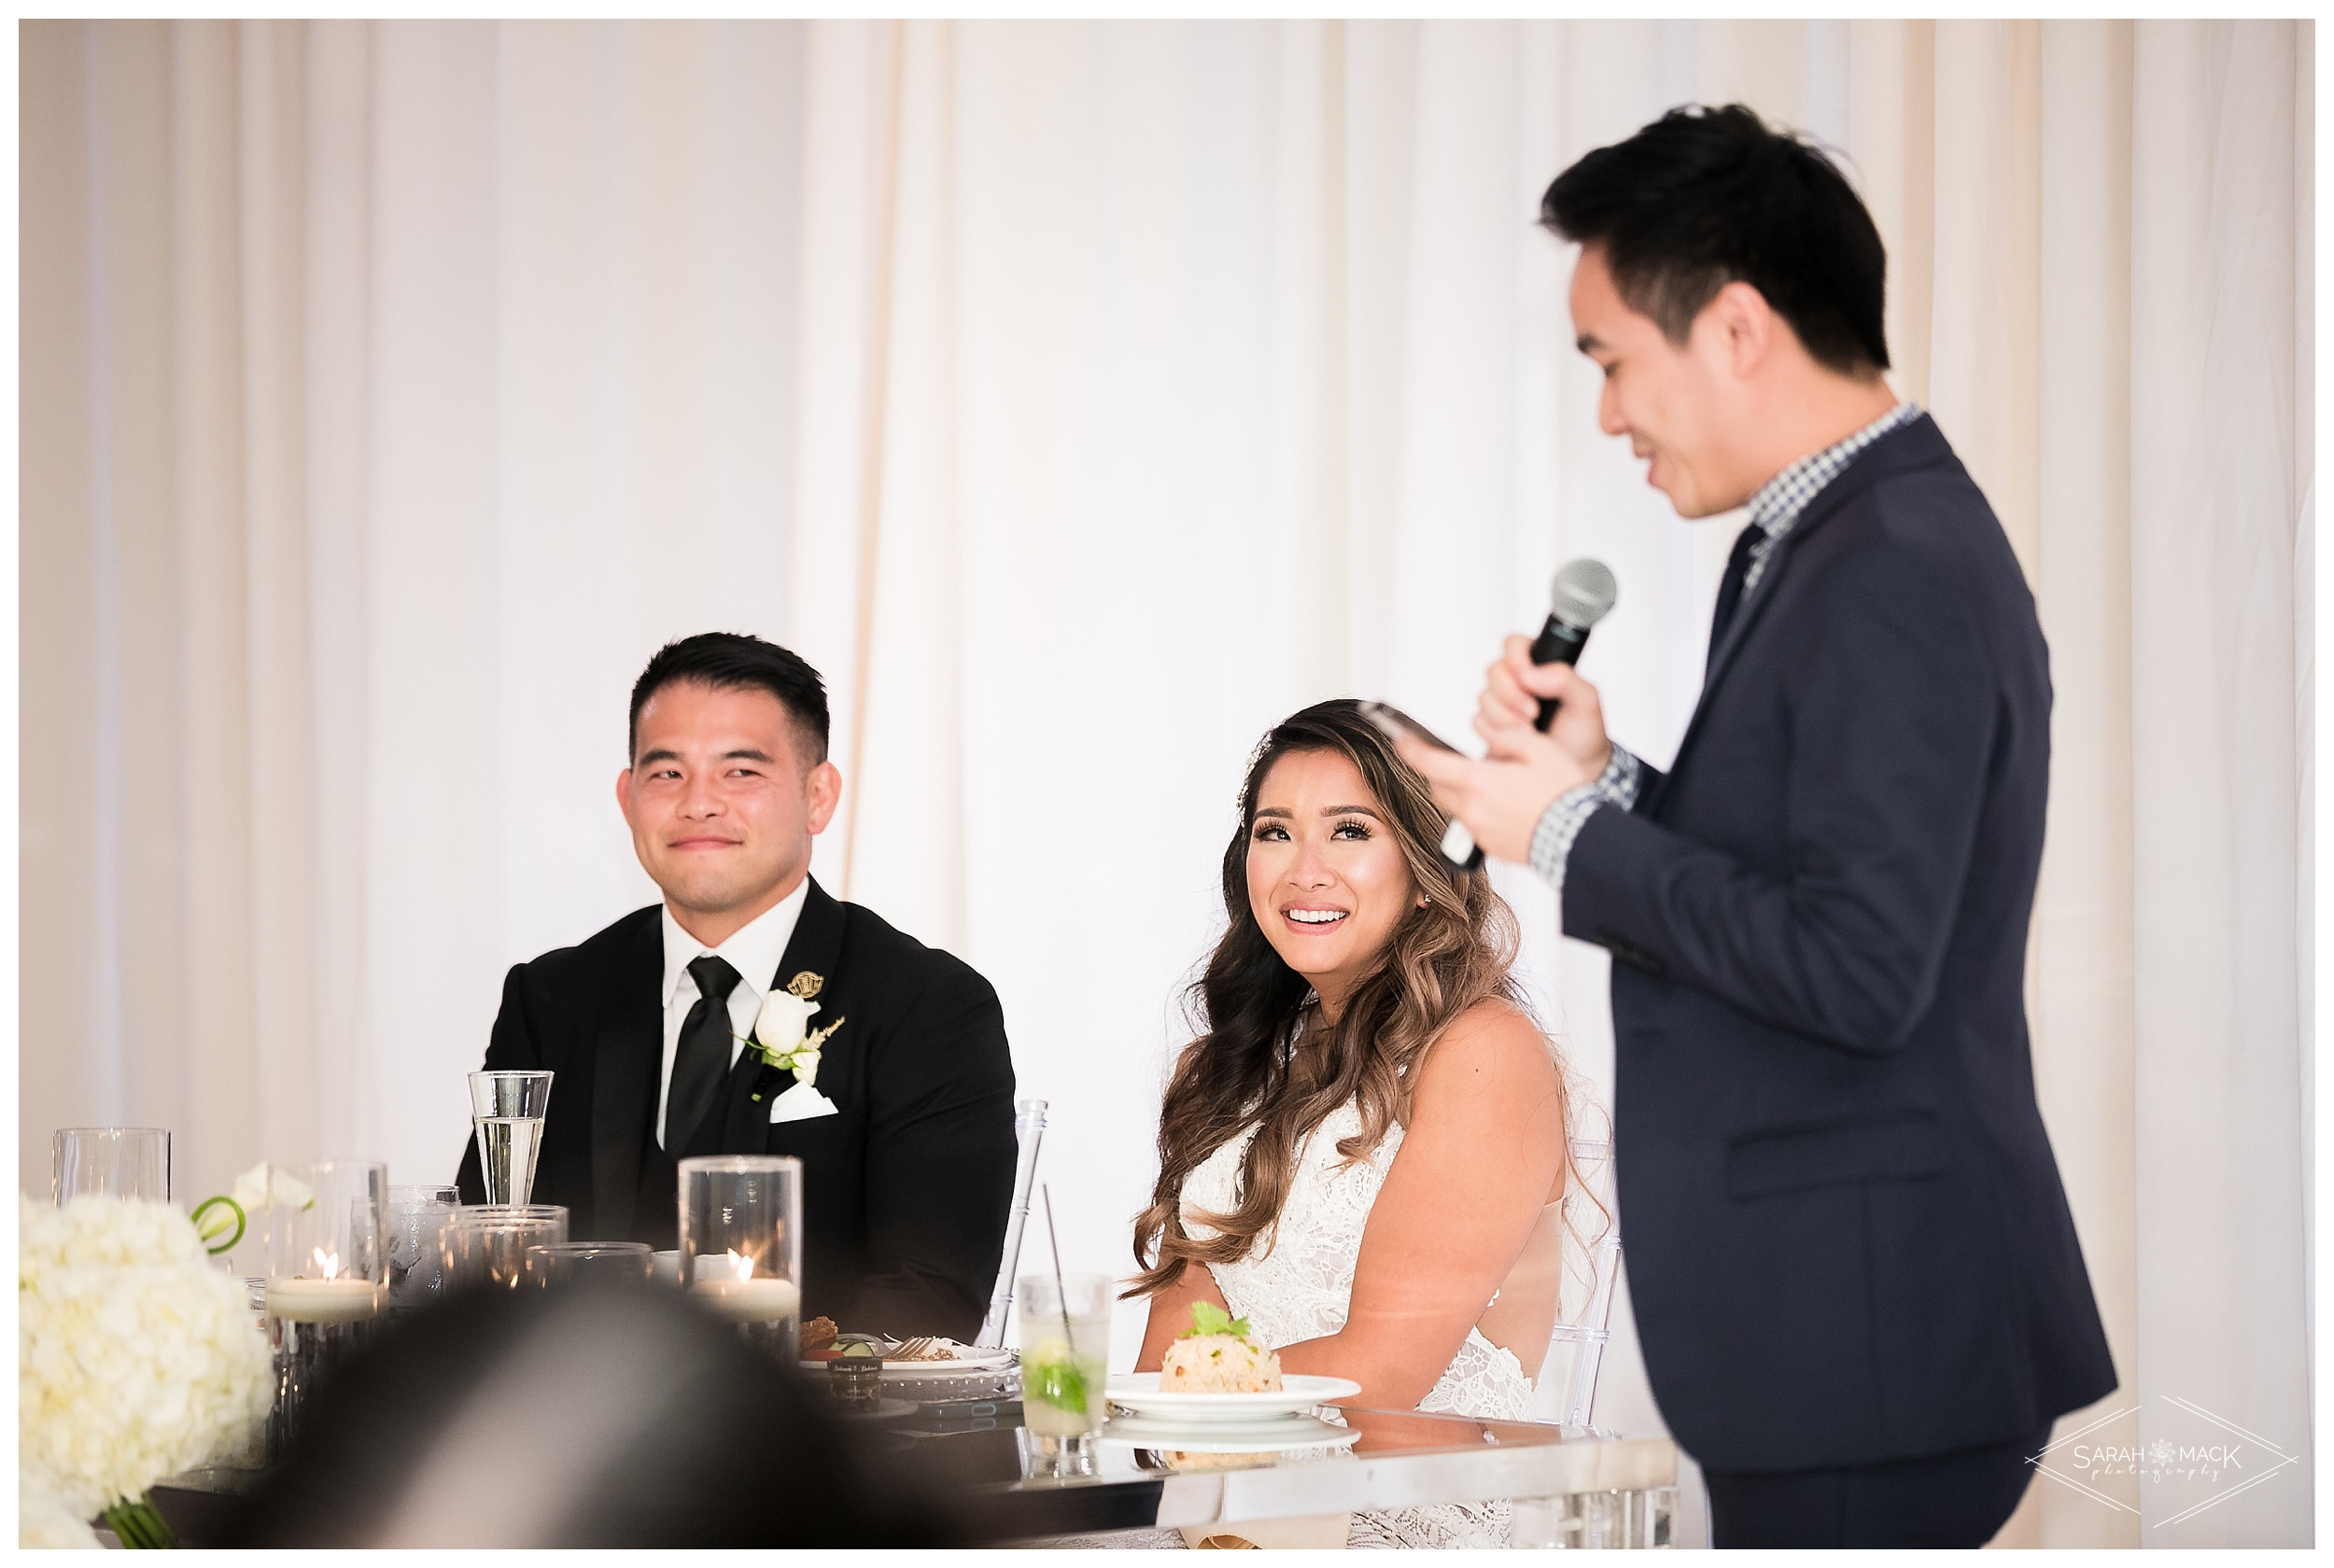 LE-Avenue-of-the-Arts-Costa-Mesa-Wedding-Photography-0197.jpg